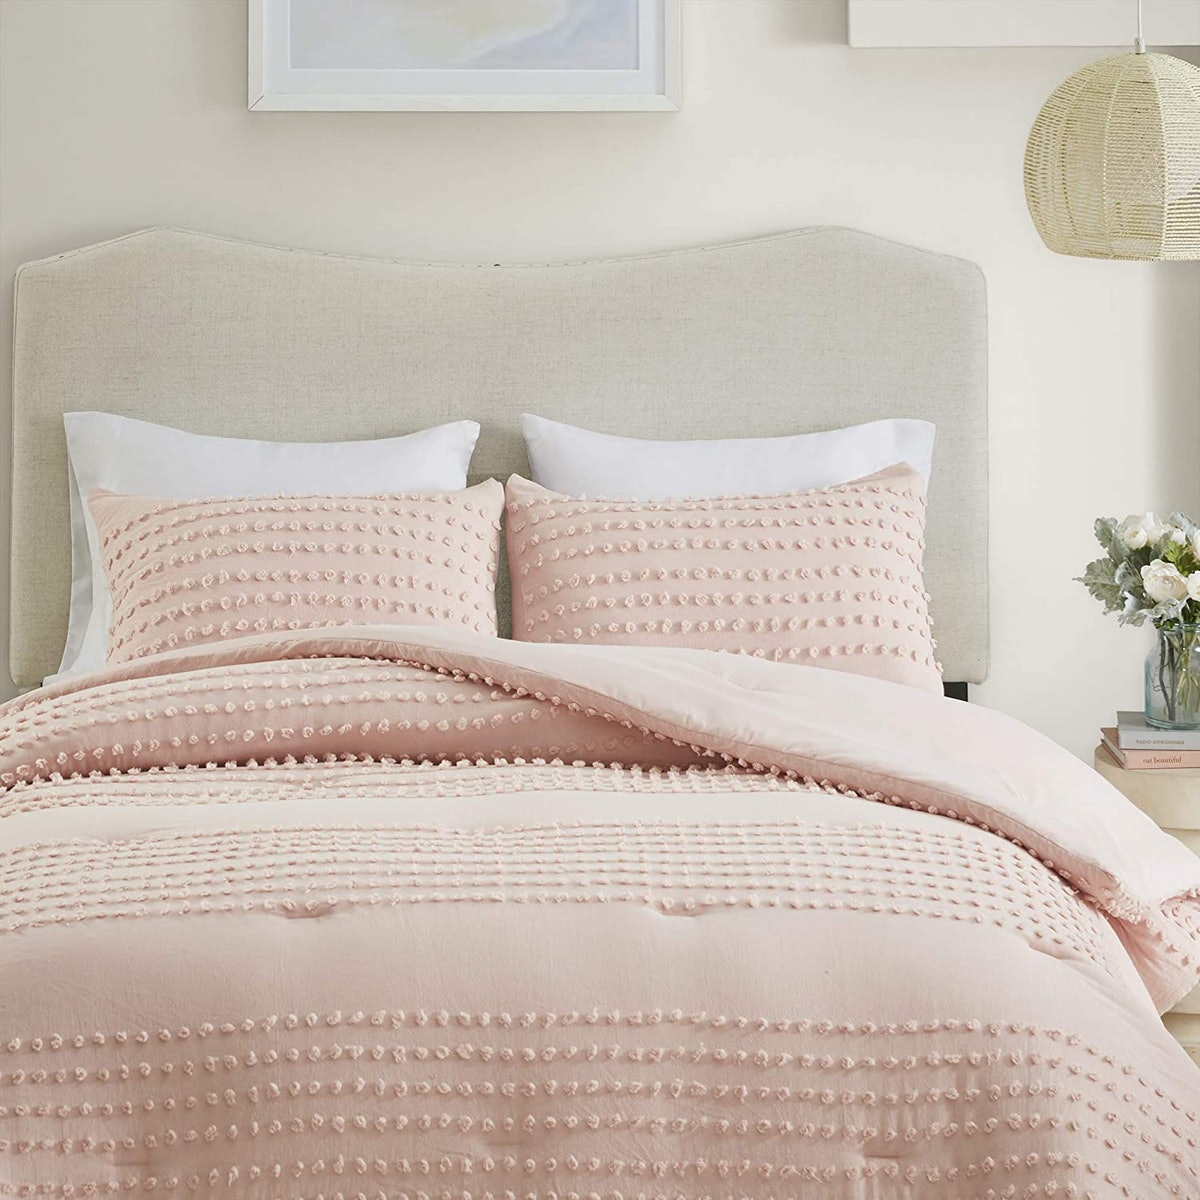 Comfort Spaces Jacquard Pom Tufts Comforter Set (3 Piece)